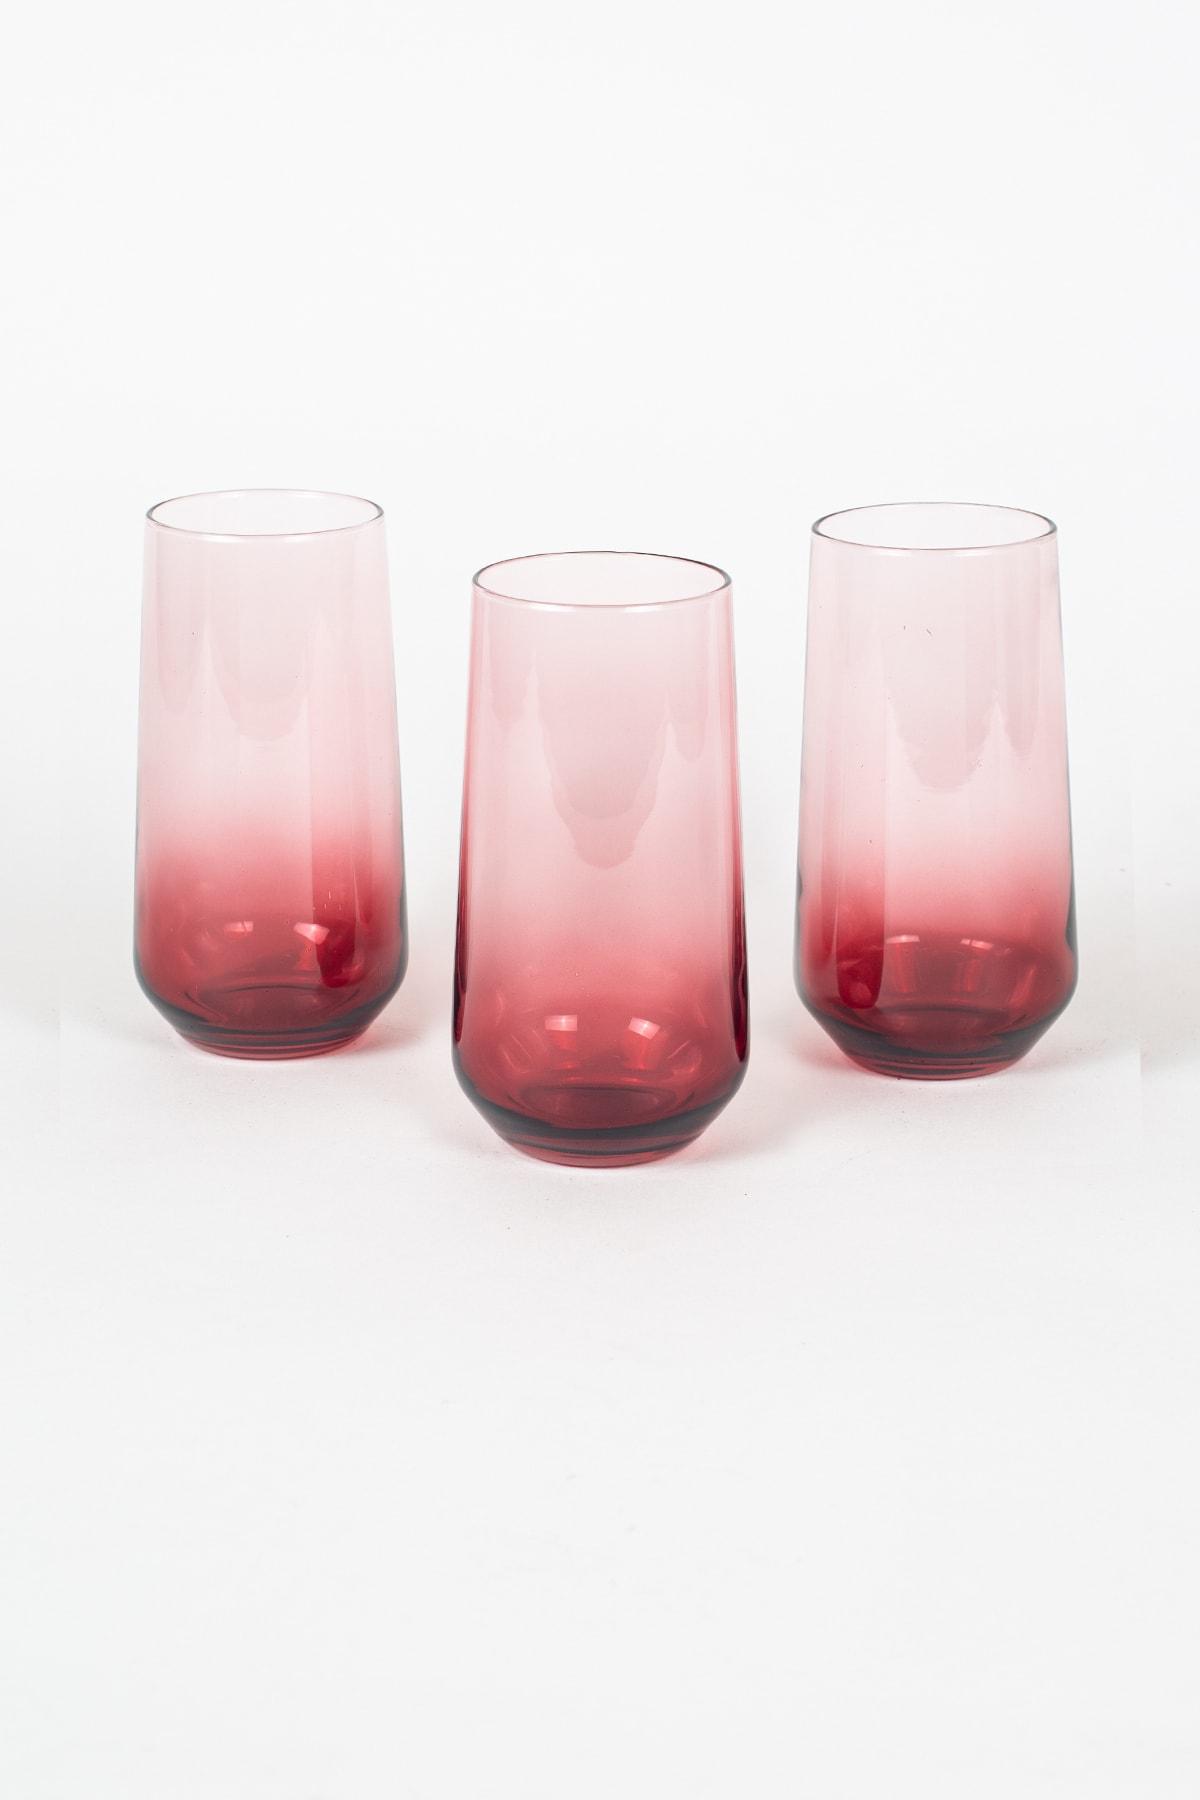 Rakle New Iconic 3'lü Meşrubat Bardağı Seti Kırmızı 470 2